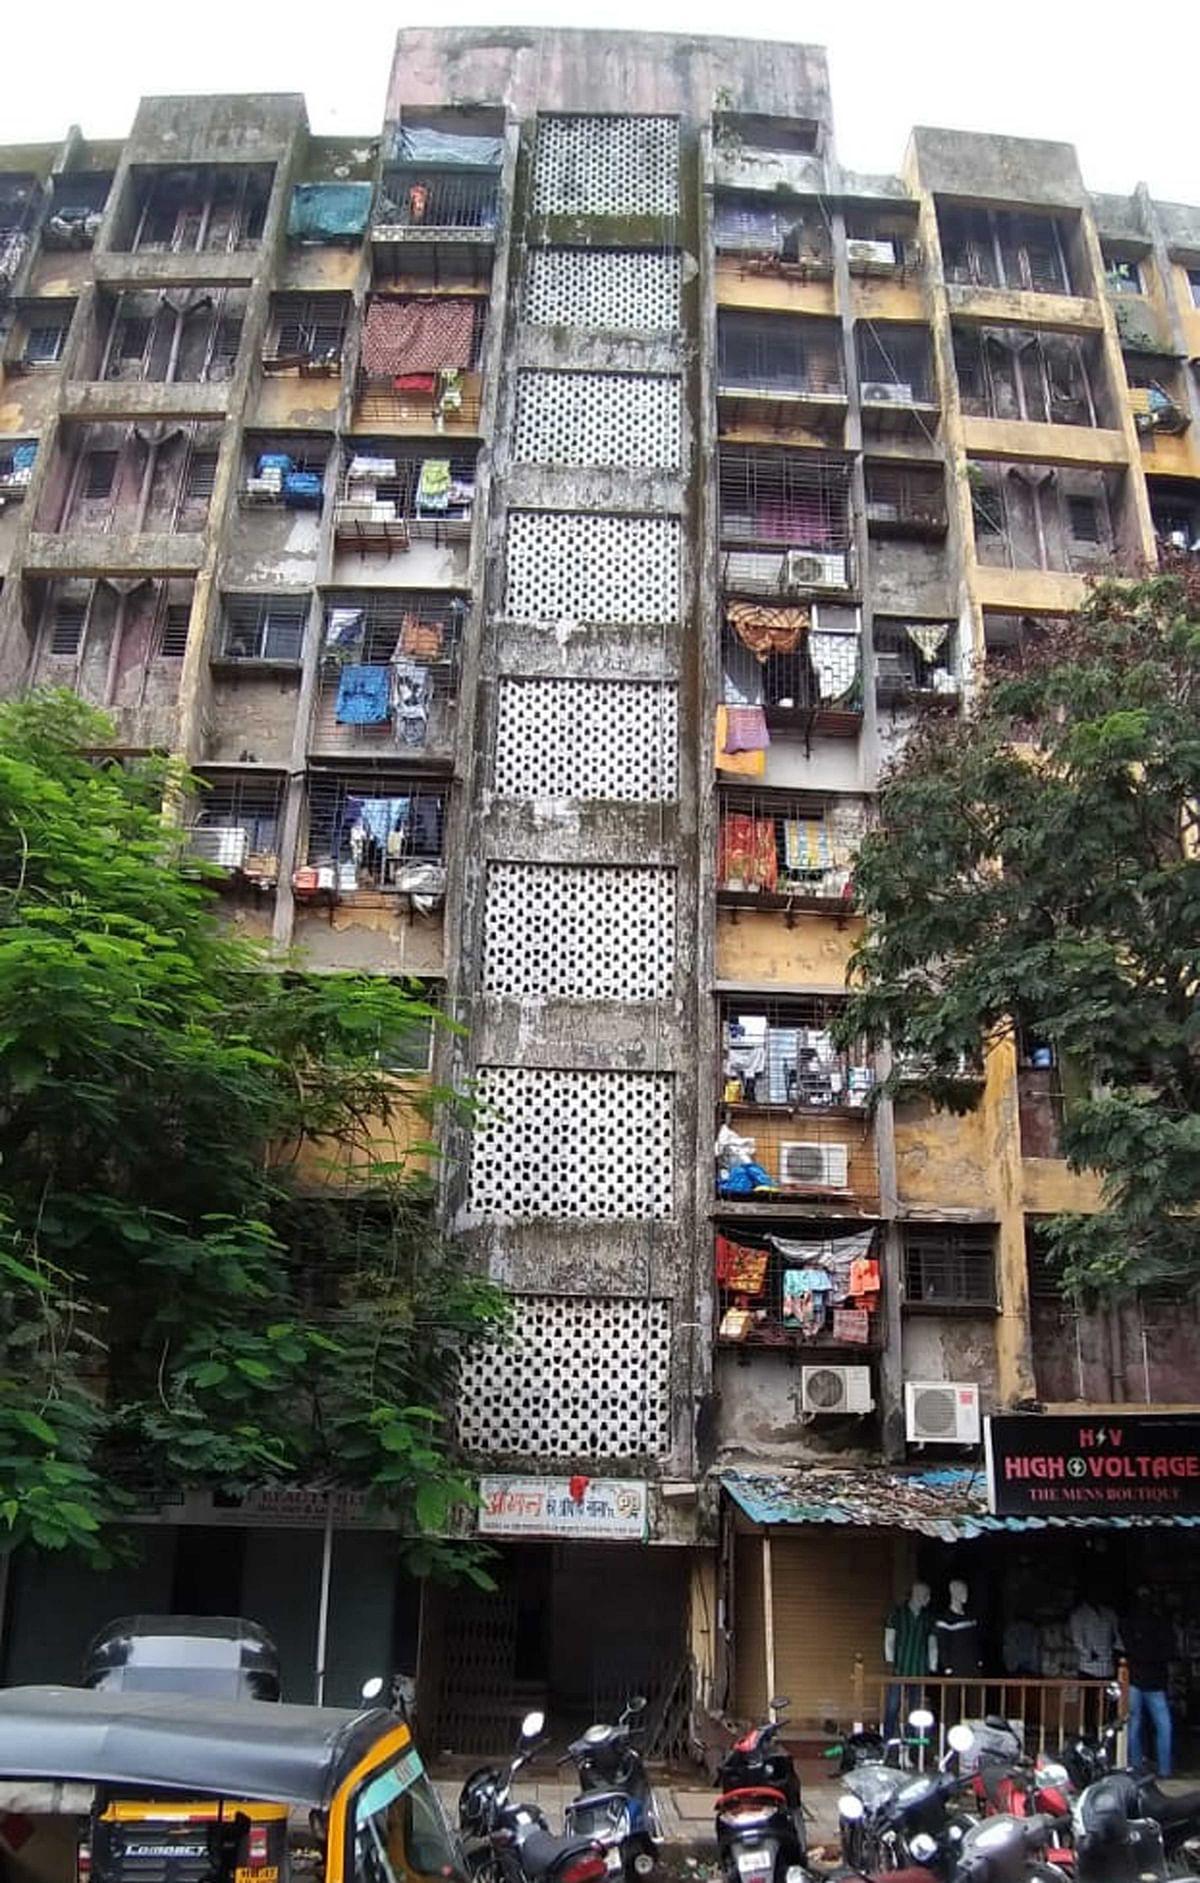 Mumbai: 8-year-old dies in sleep as part of ceiling collapses in Goregaon